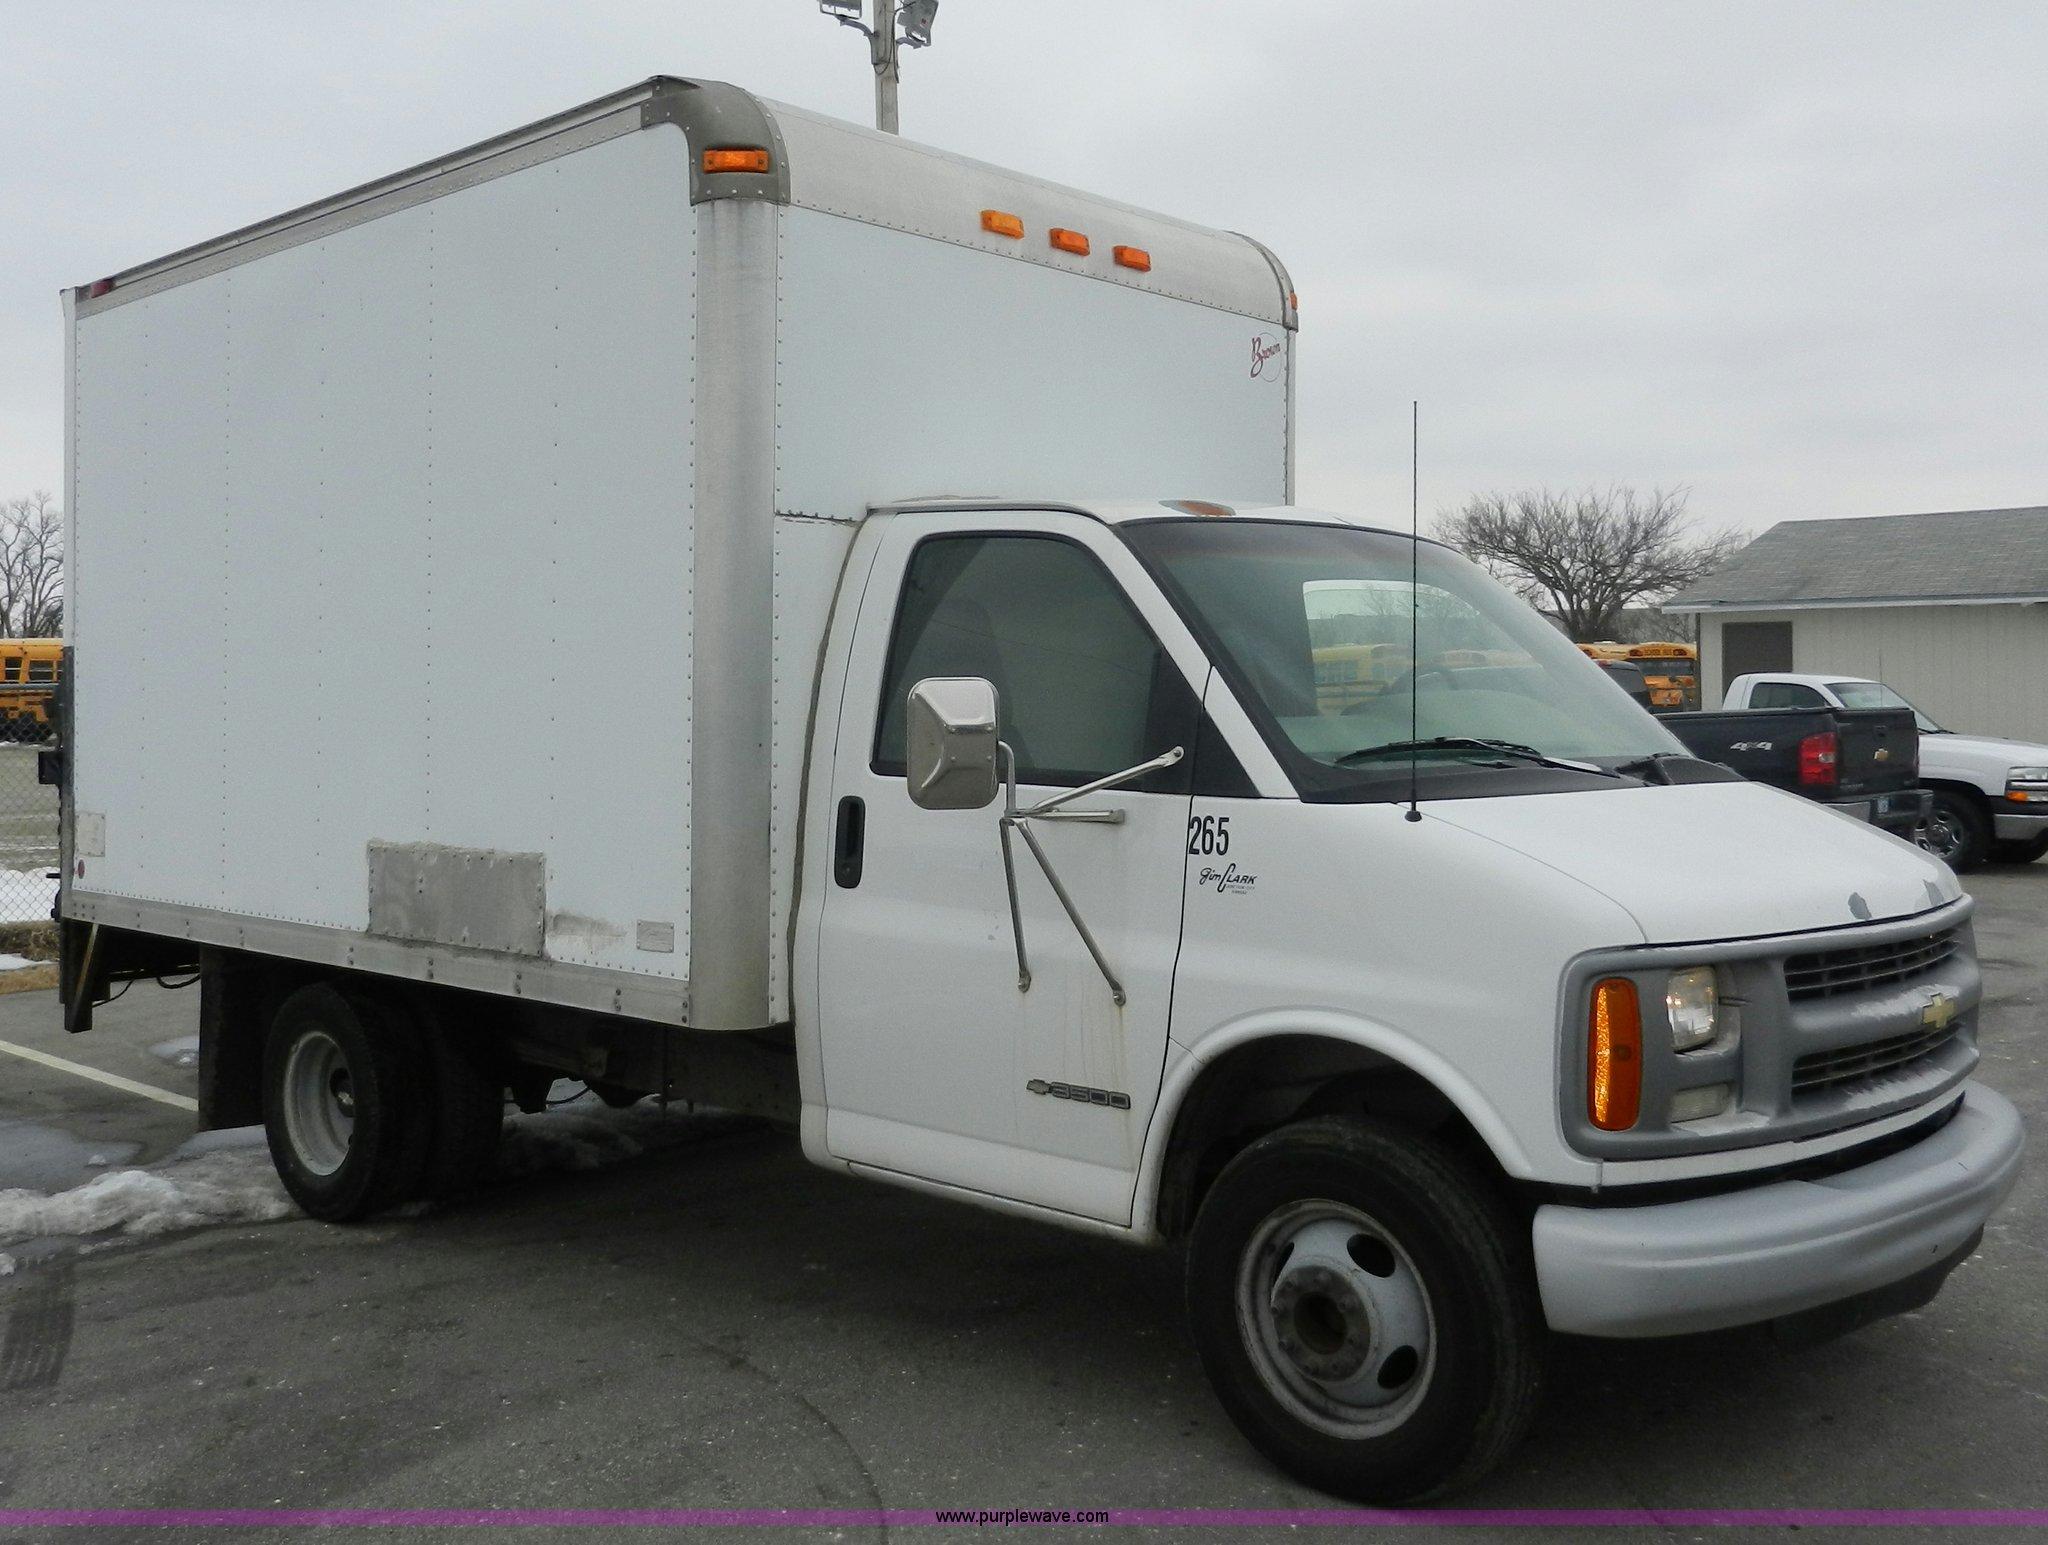 1999 chevrolet express 3500 cargo box truck item a3952 s rh purplewave com 2025 Chevy Trucks 2040 Cars Chevy Mud Truck